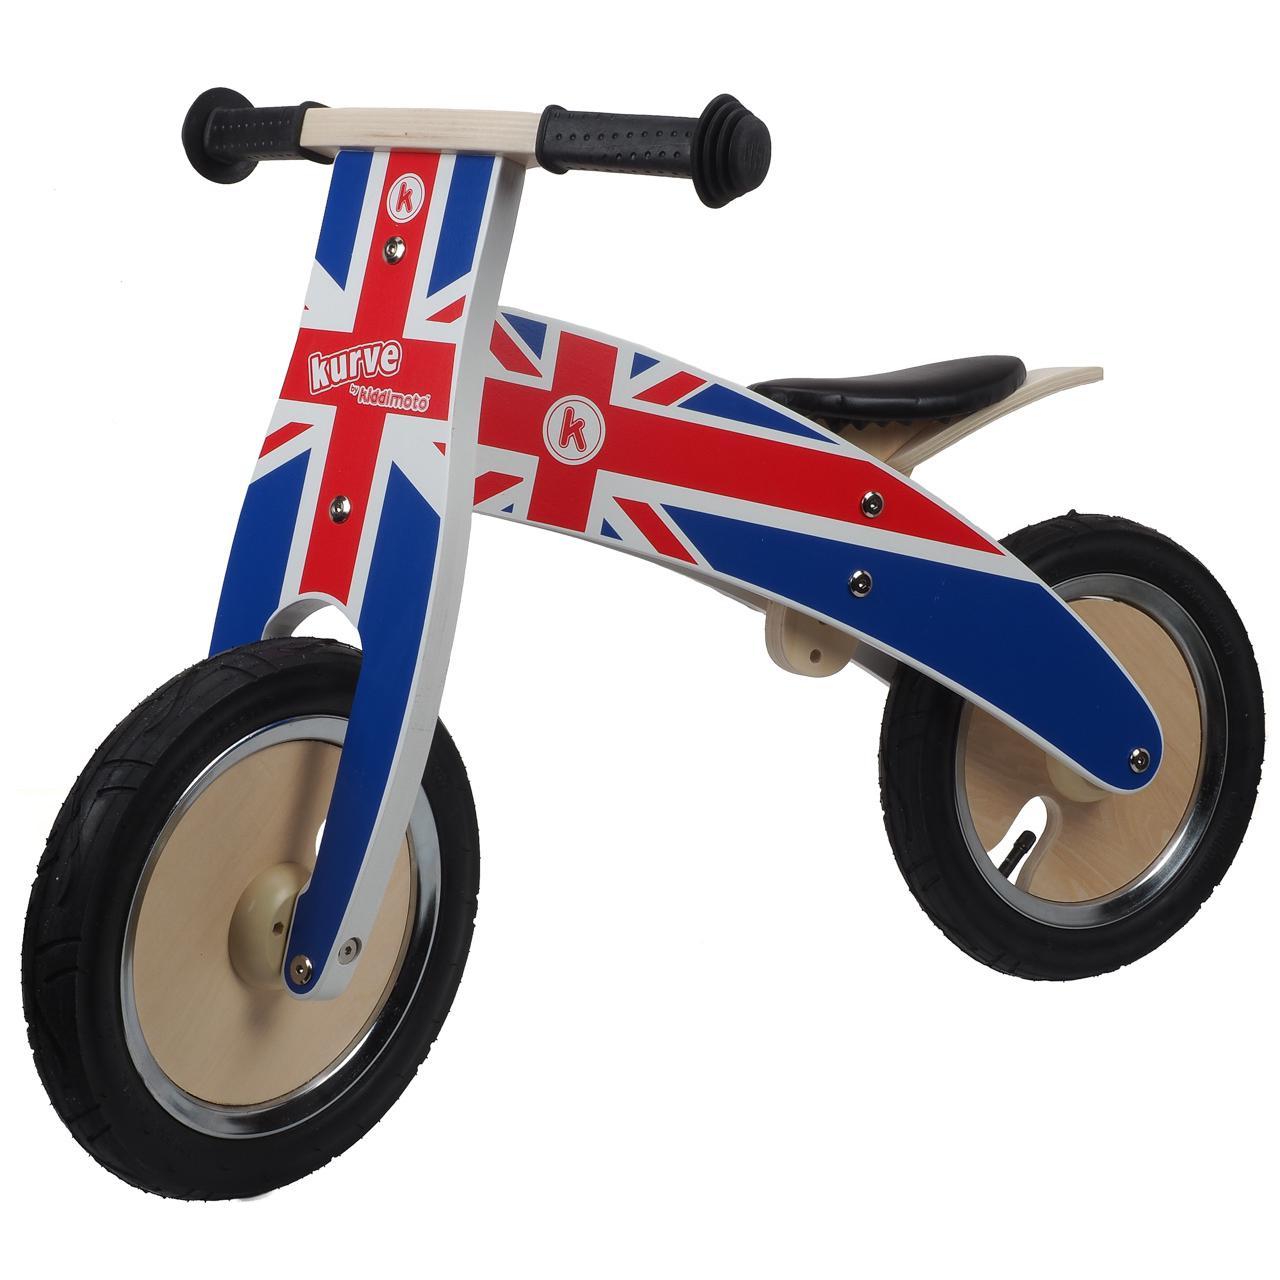 Bike-Icare-Distribution-Kiddi-Motorcycle-Kurve-Union-Ja-White-13165-New